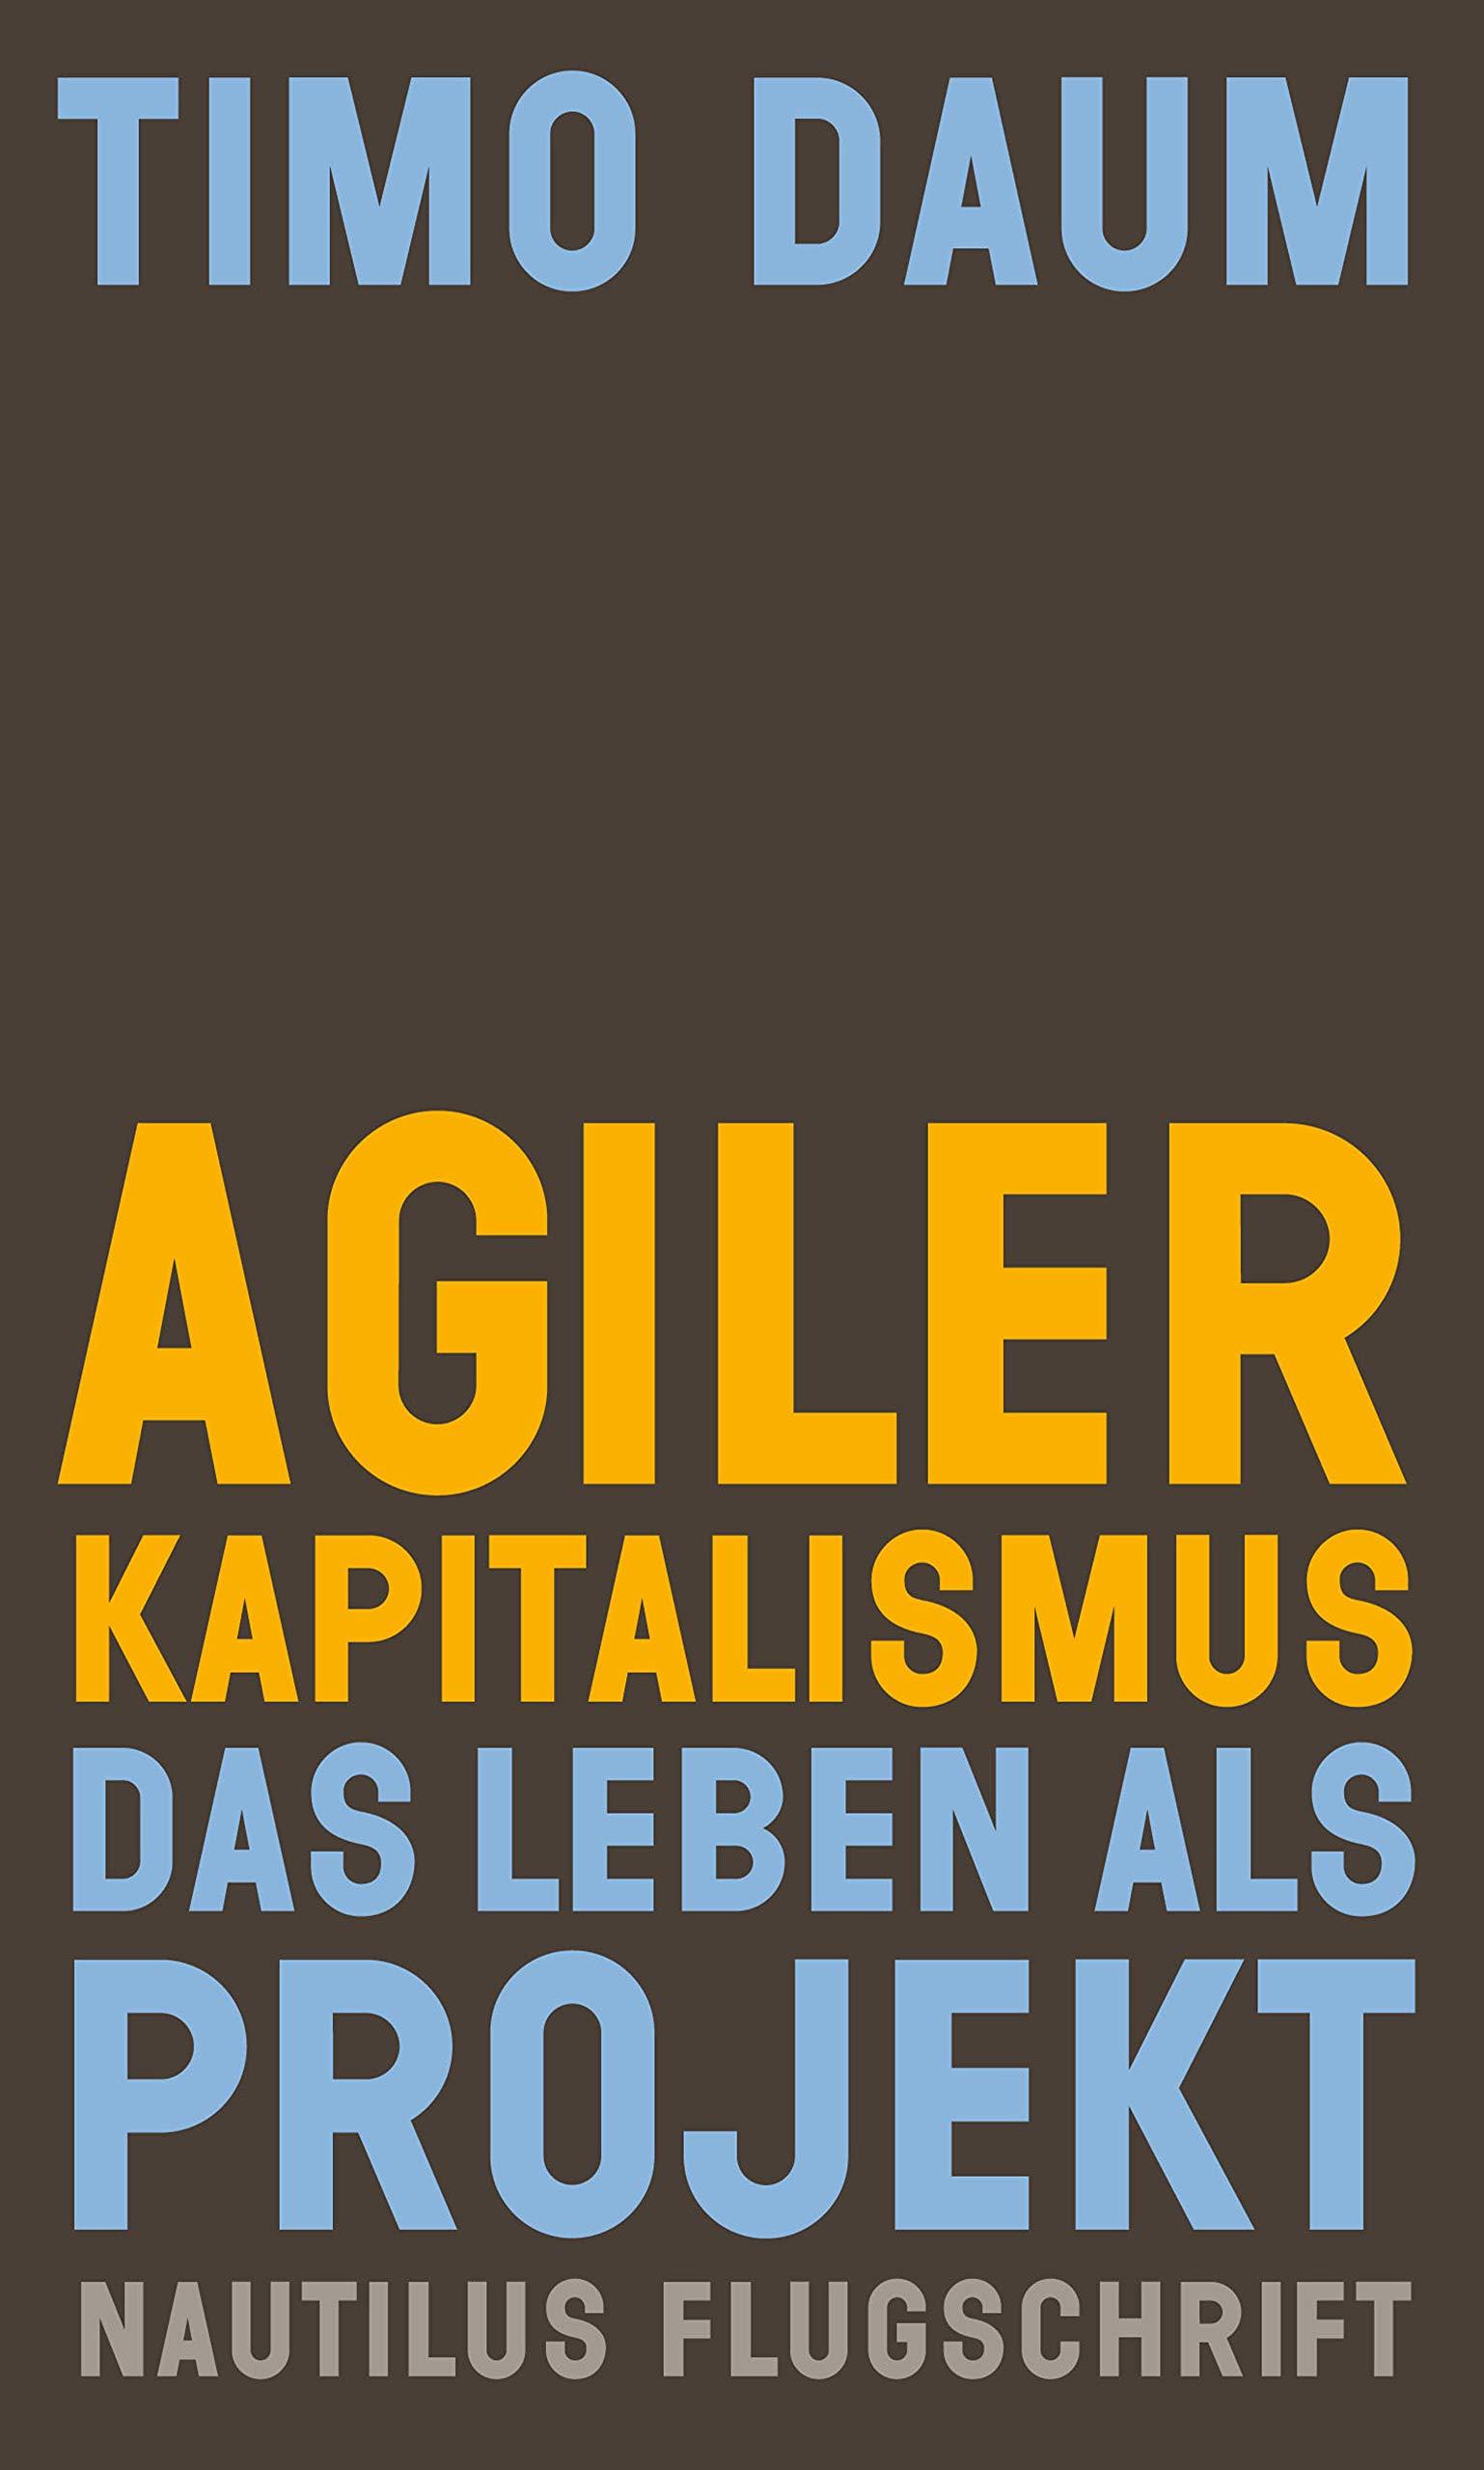 Agiler Kapitalismus: Das Leben als Projekt (Nautilus Flugschrift) (German Edition)